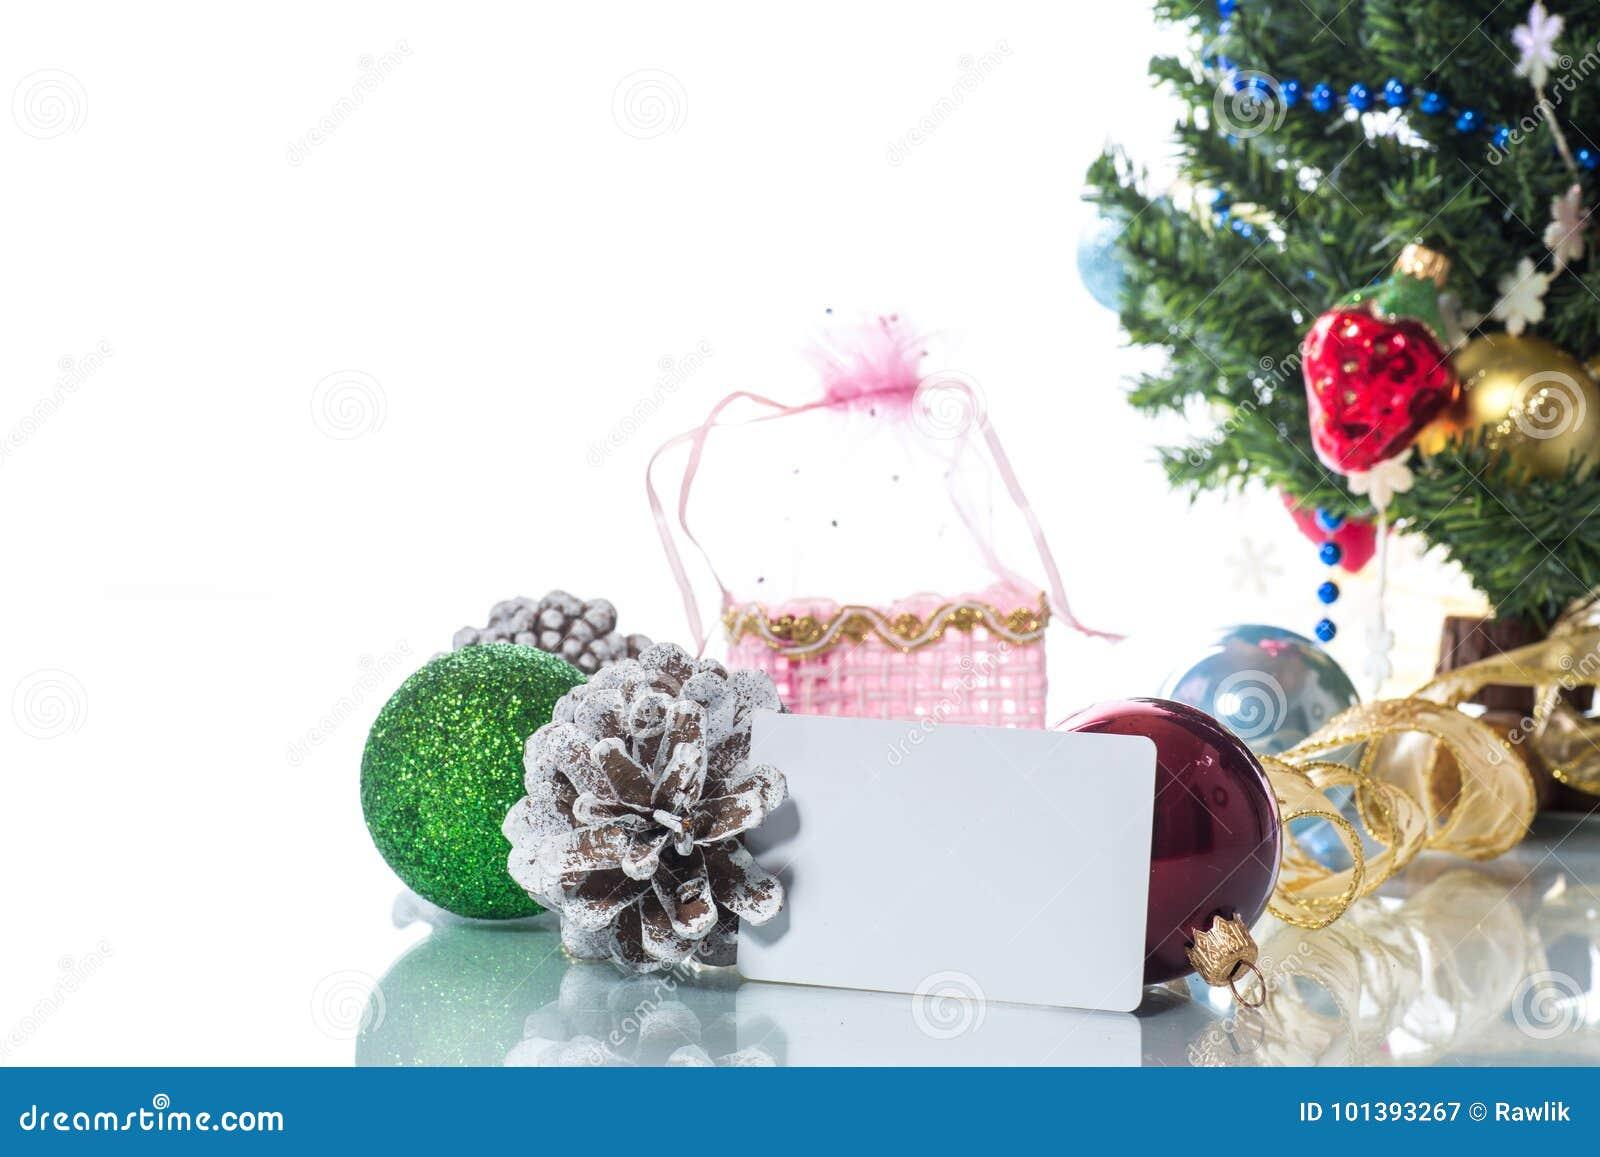 Multicolored Christmas Ornaments